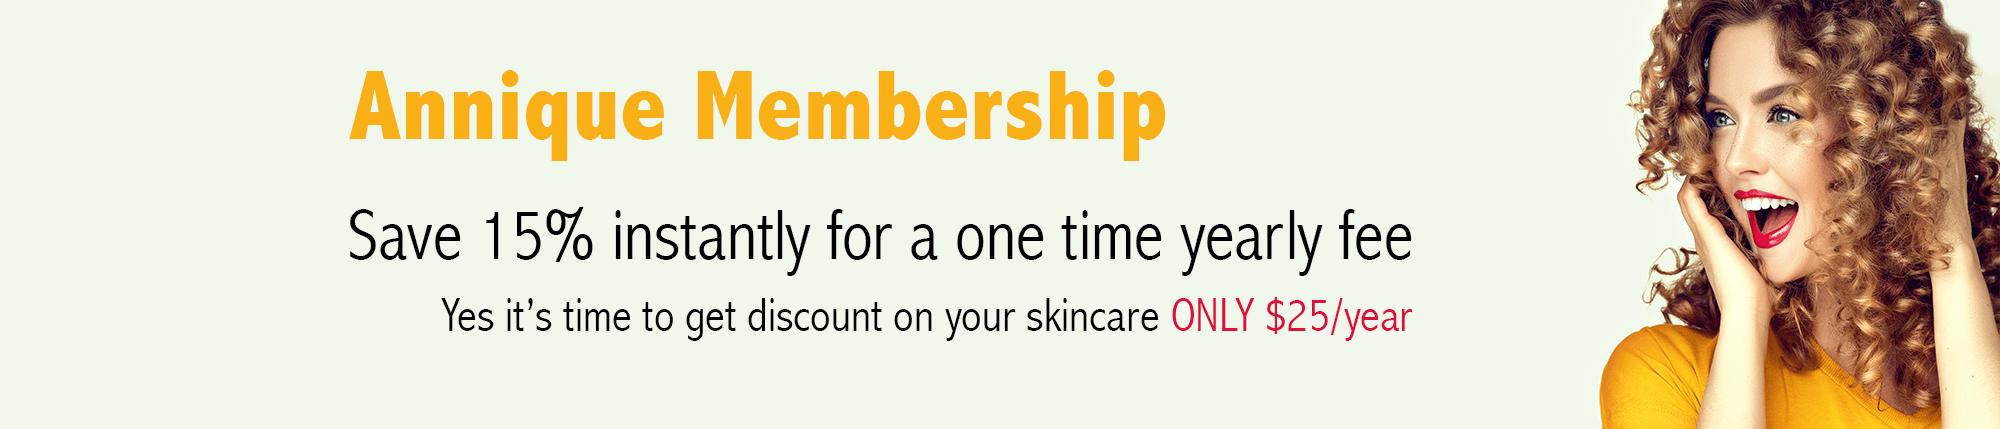 Anniqe membership banner